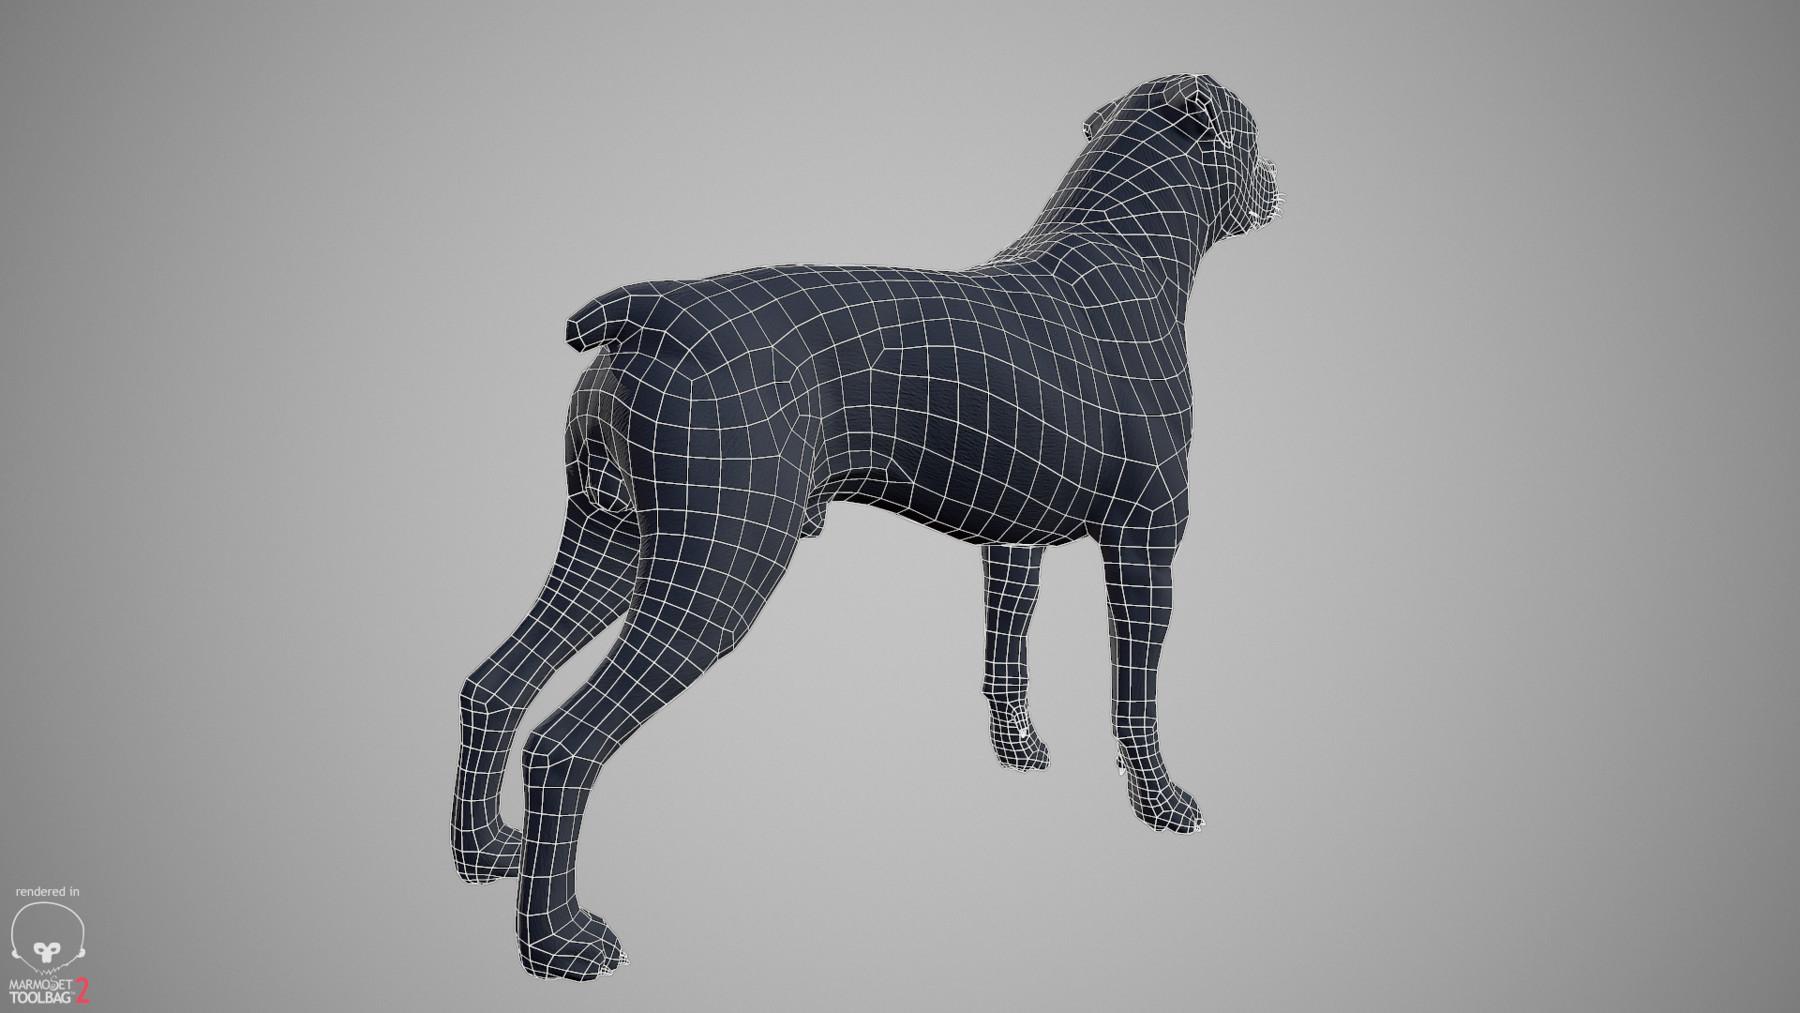 Rottweiler by alexlashko wireframe 02